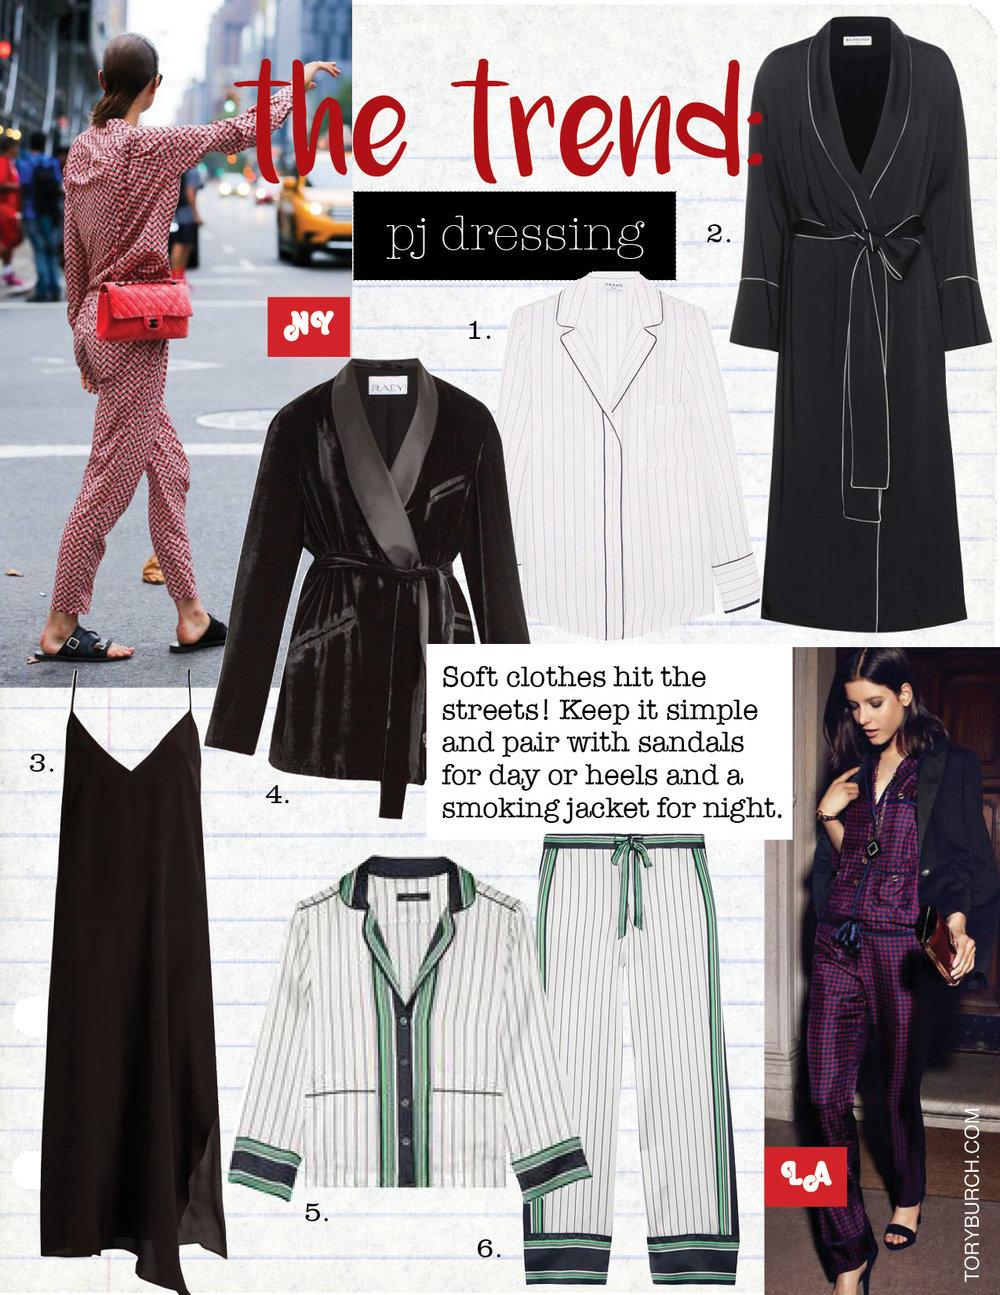 1. frame striped silk shirt, $275,  net-a-porter.com  2. balenciaga satin robe, $2050,  mytheresa.com  3. raey asymmetric-hem silk slip dress, $225,  Matchesfashion.com  4. raey velvet smoking jacket, $743,  matchesfashion.com  5. kate moss for equipment lake striped silk-satin pajama shirt, $275,  net-a-porter.com  6. kate moss for equipment lake striped silk-satin pajama pants, $295,  net-a-porter.com